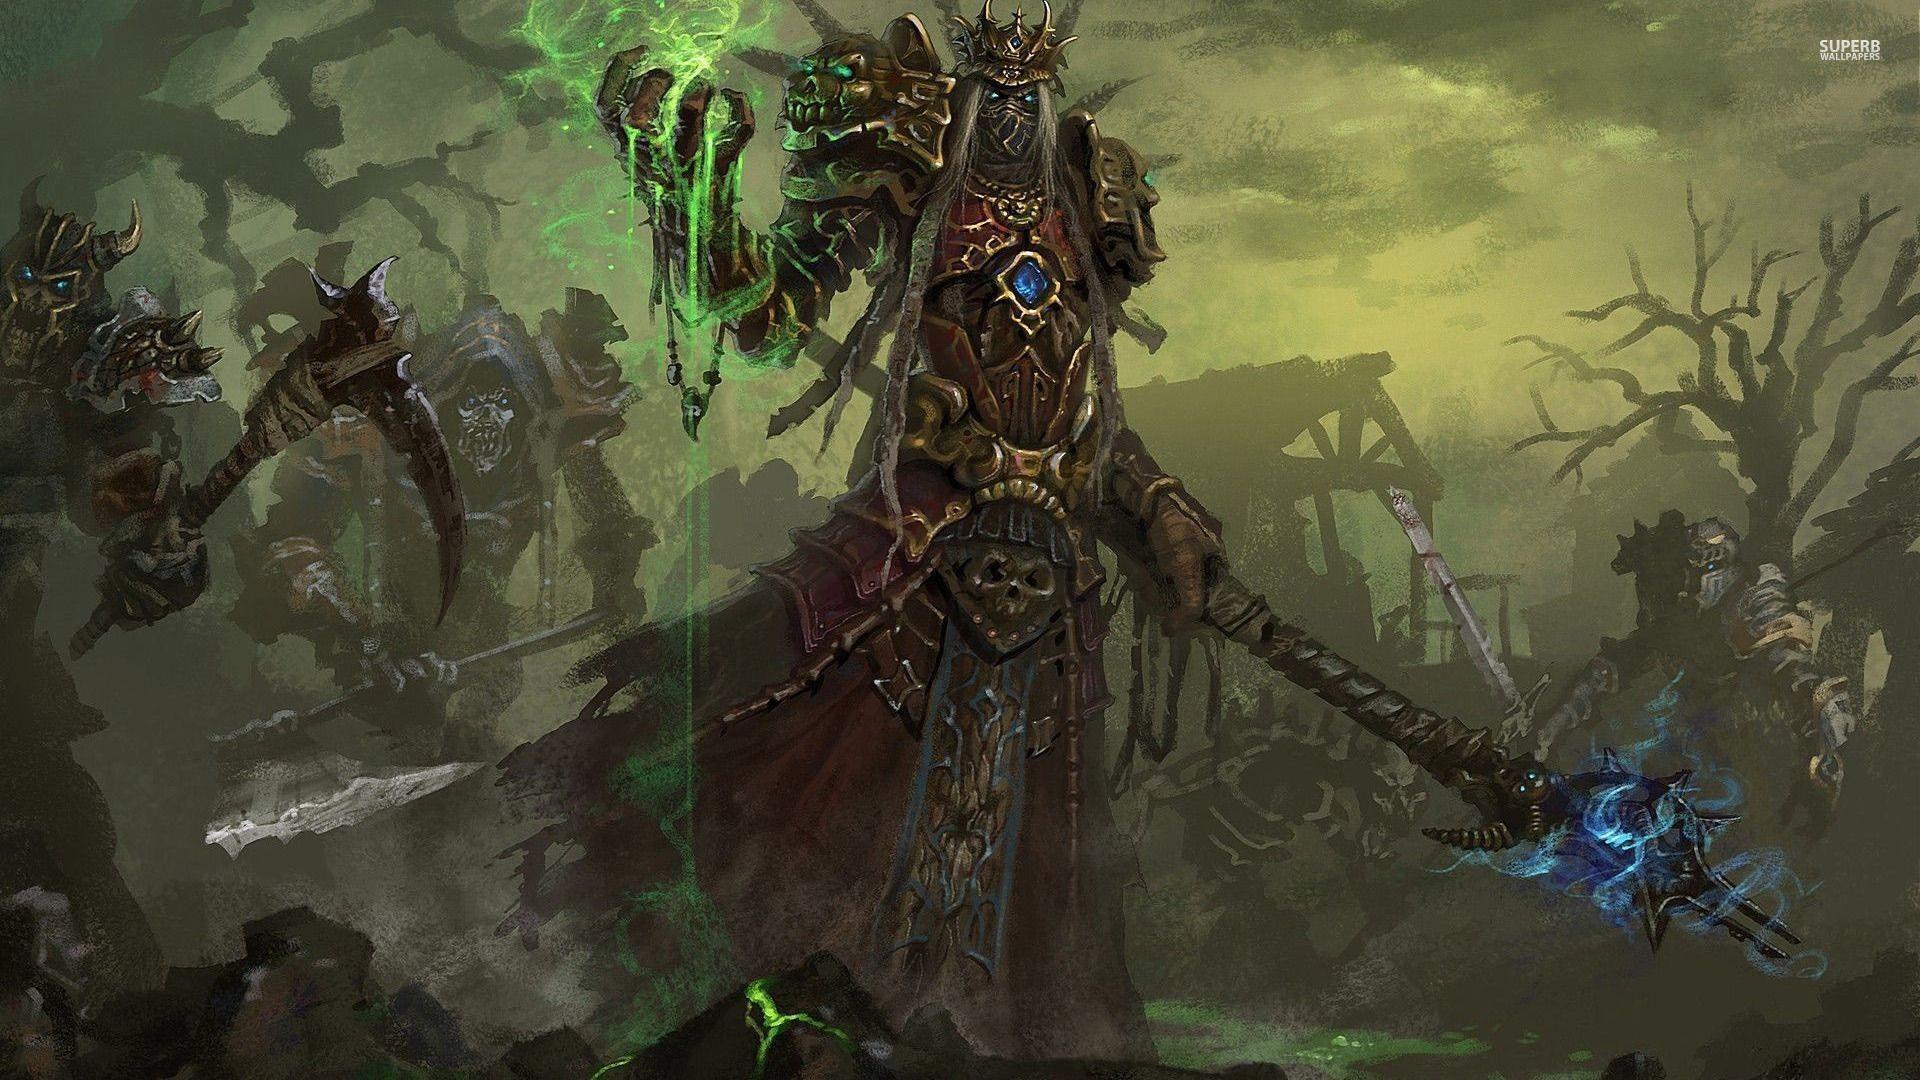 Undead warlock – World of Warcraft wallpaper – Game wallpapers .